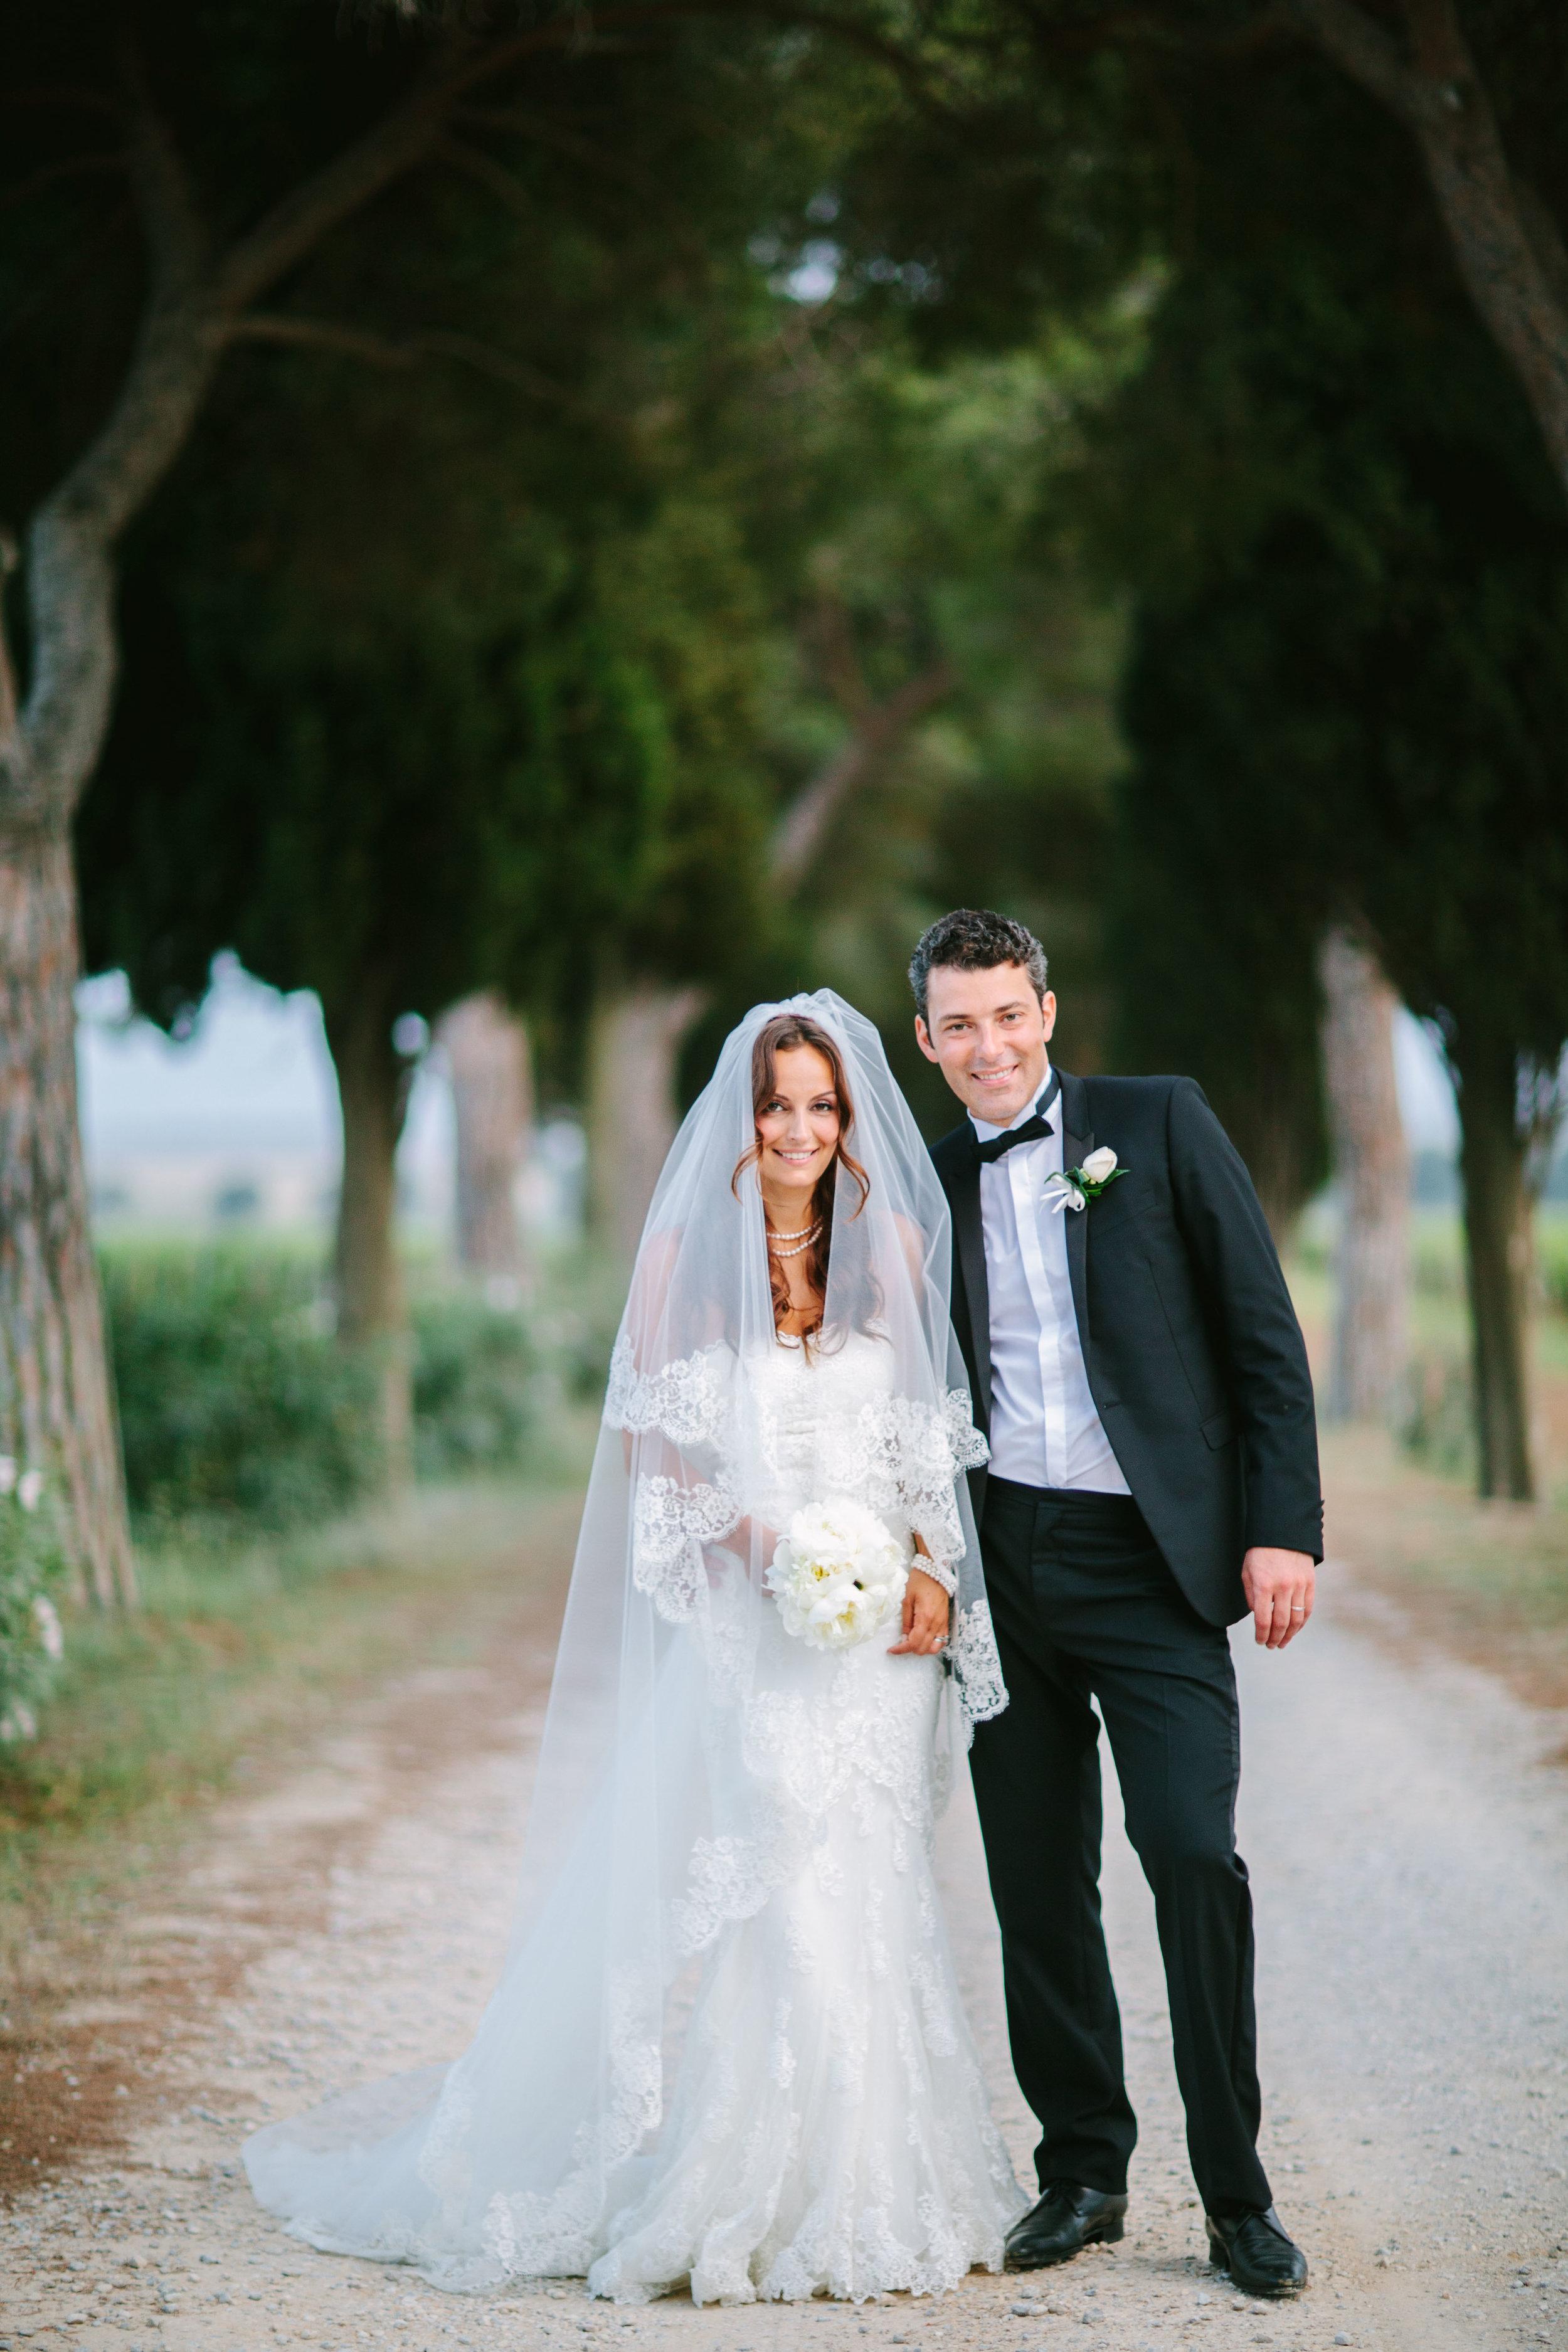 Sylvia & Benjamin 116@Jimena Roquero Photography.jpg